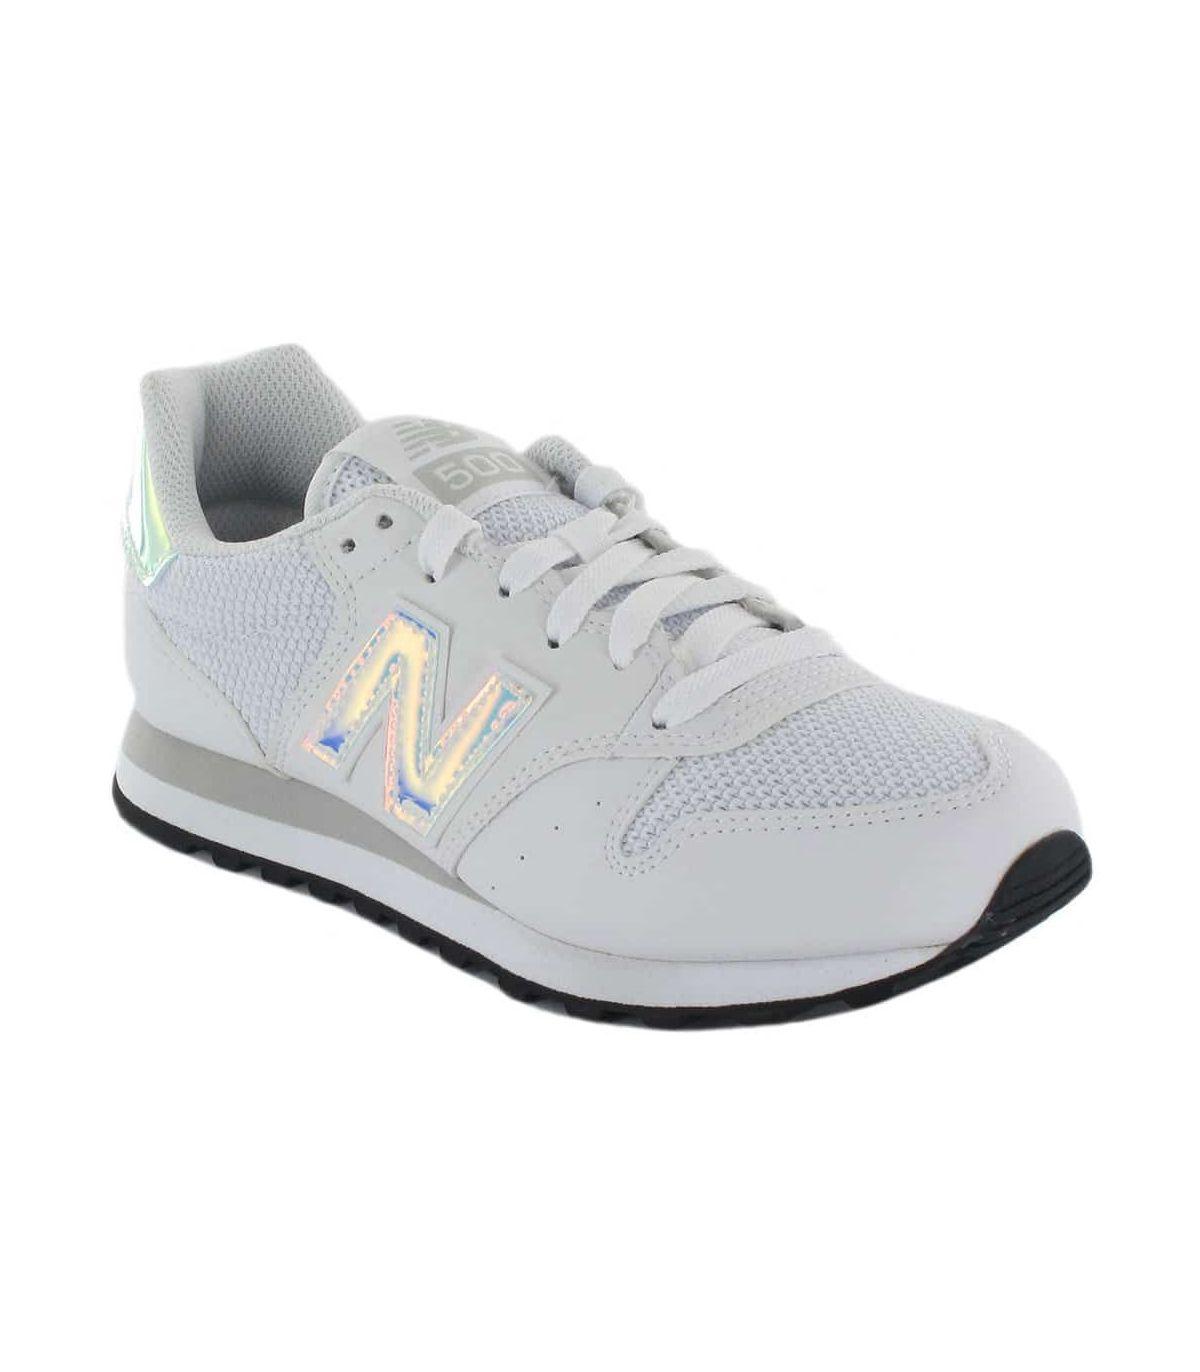 New Balance GW500HGX New Balance Shoes Women's Casual Lifestyle Sizes: 36, 37, 38, 39, 40, 41; Color: white